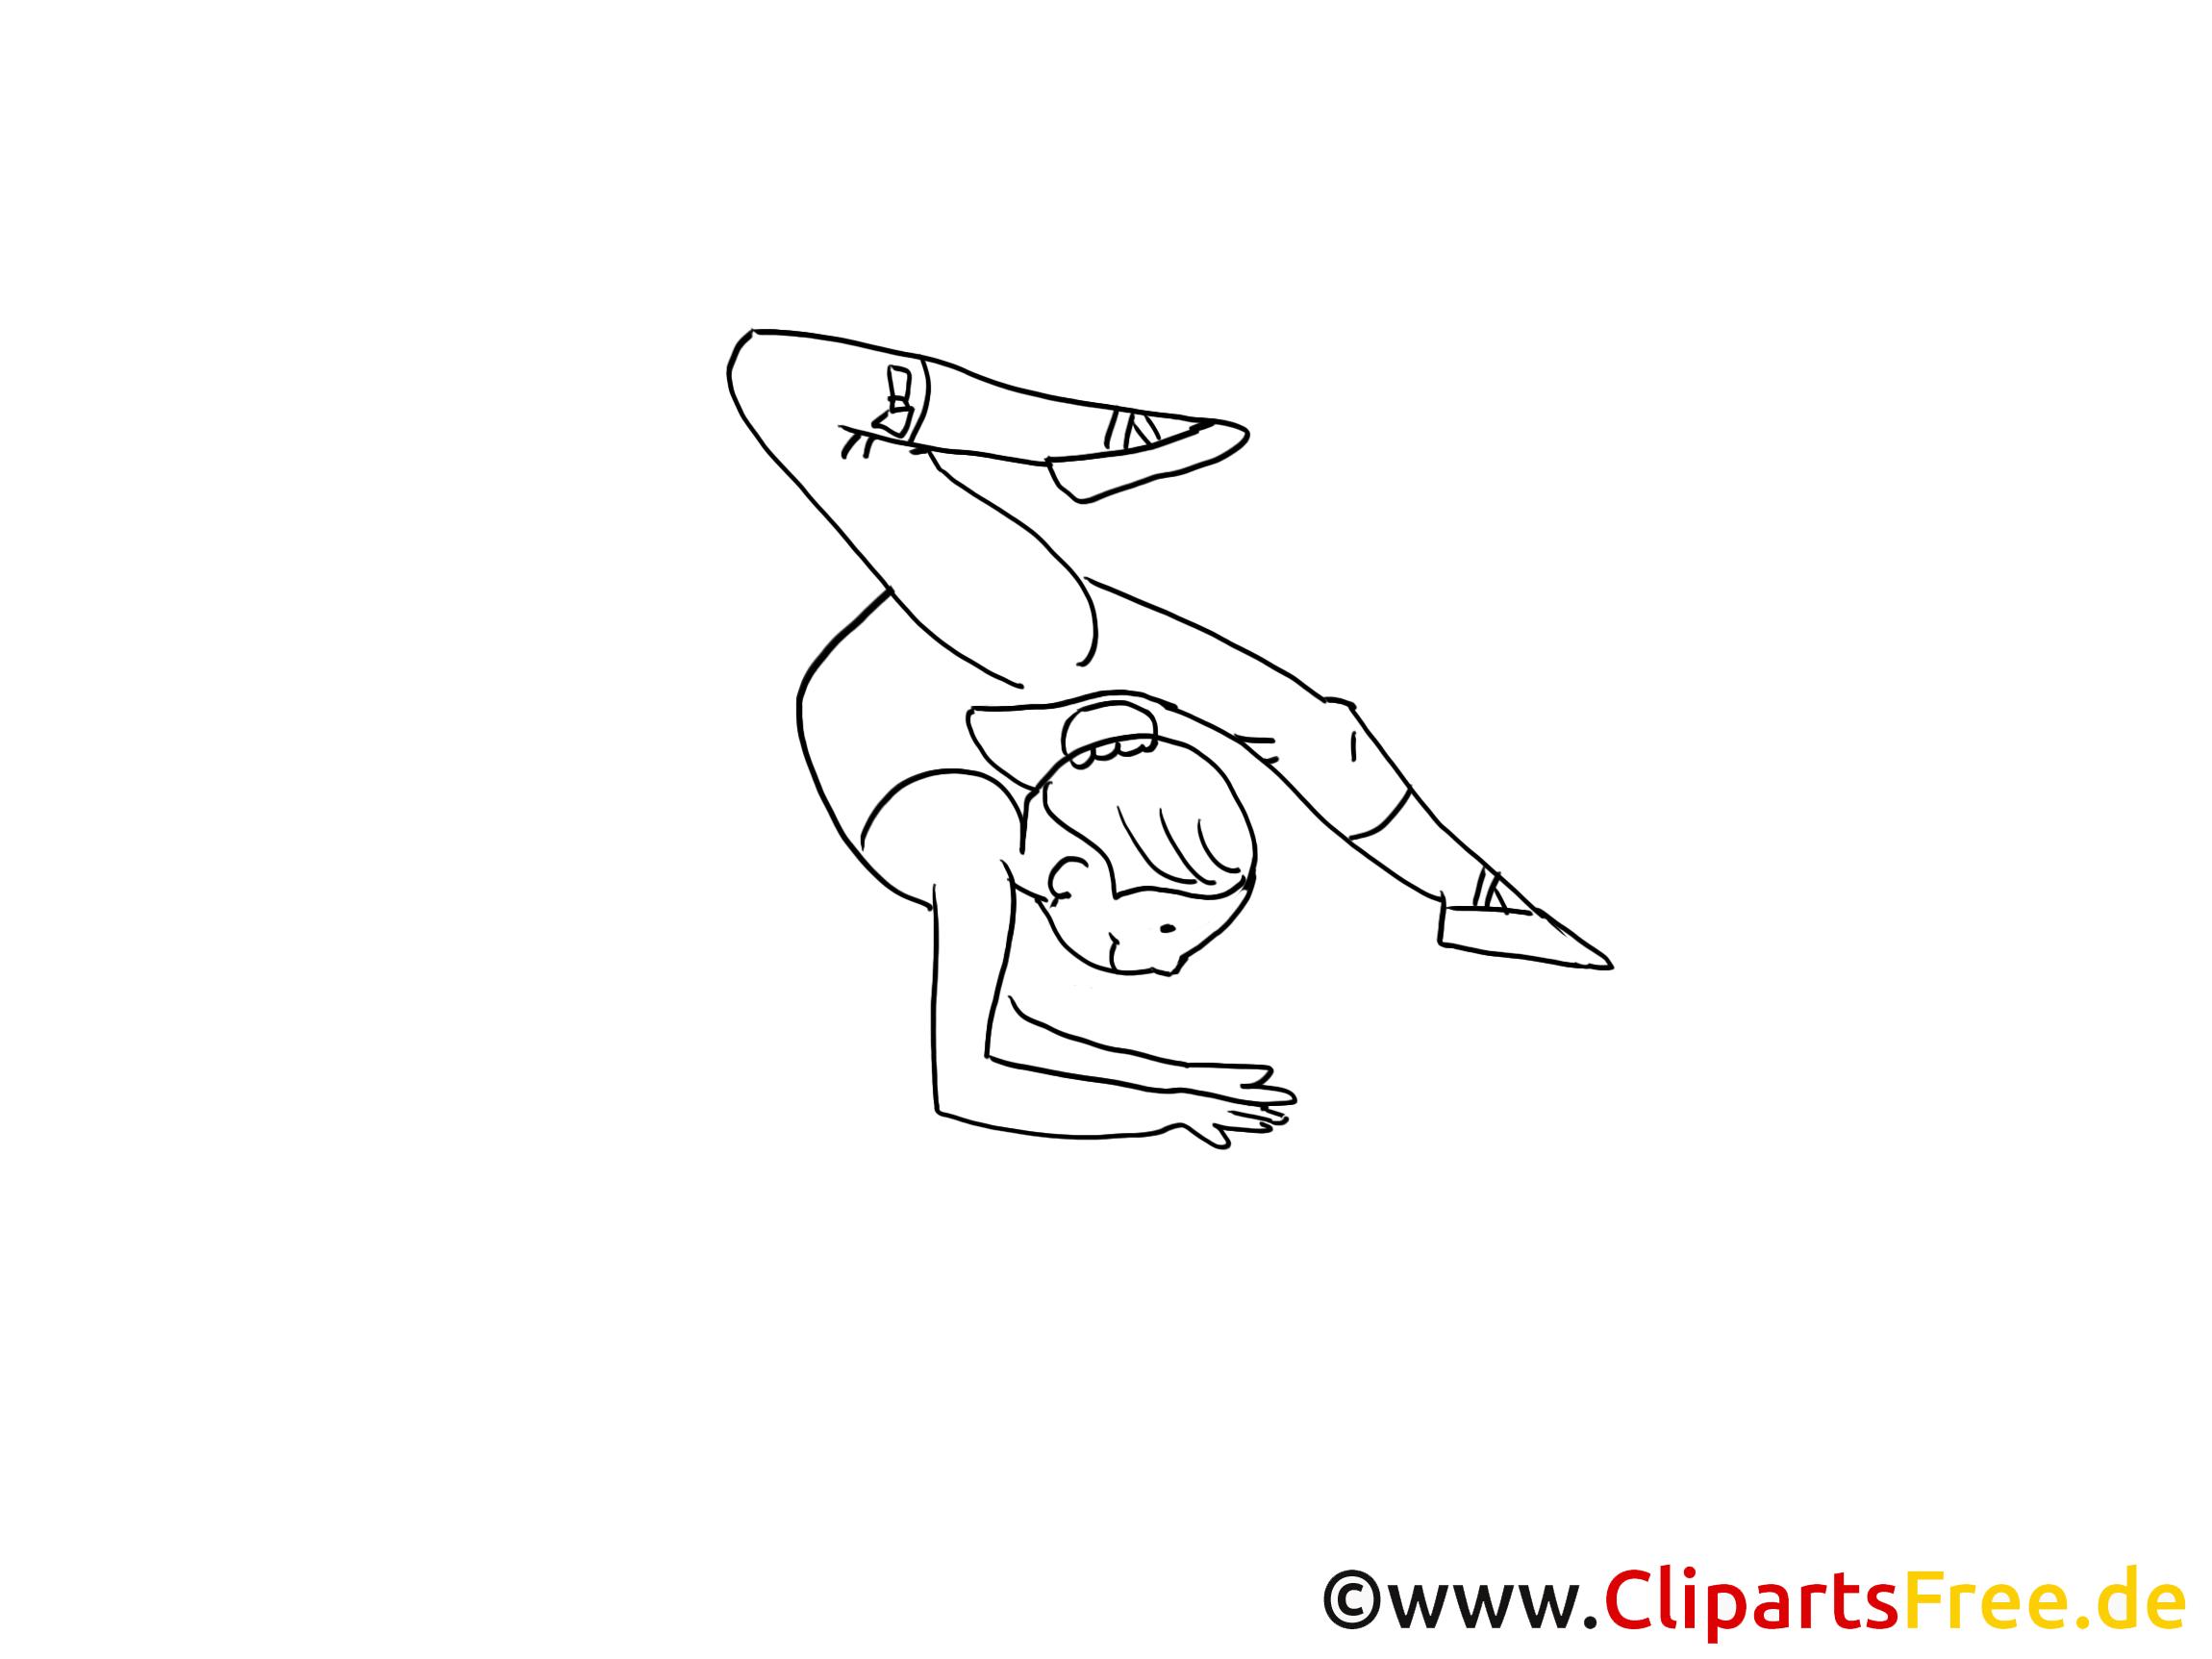 yoga zeichnung clipart bild comic. Black Bedroom Furniture Sets. Home Design Ideas